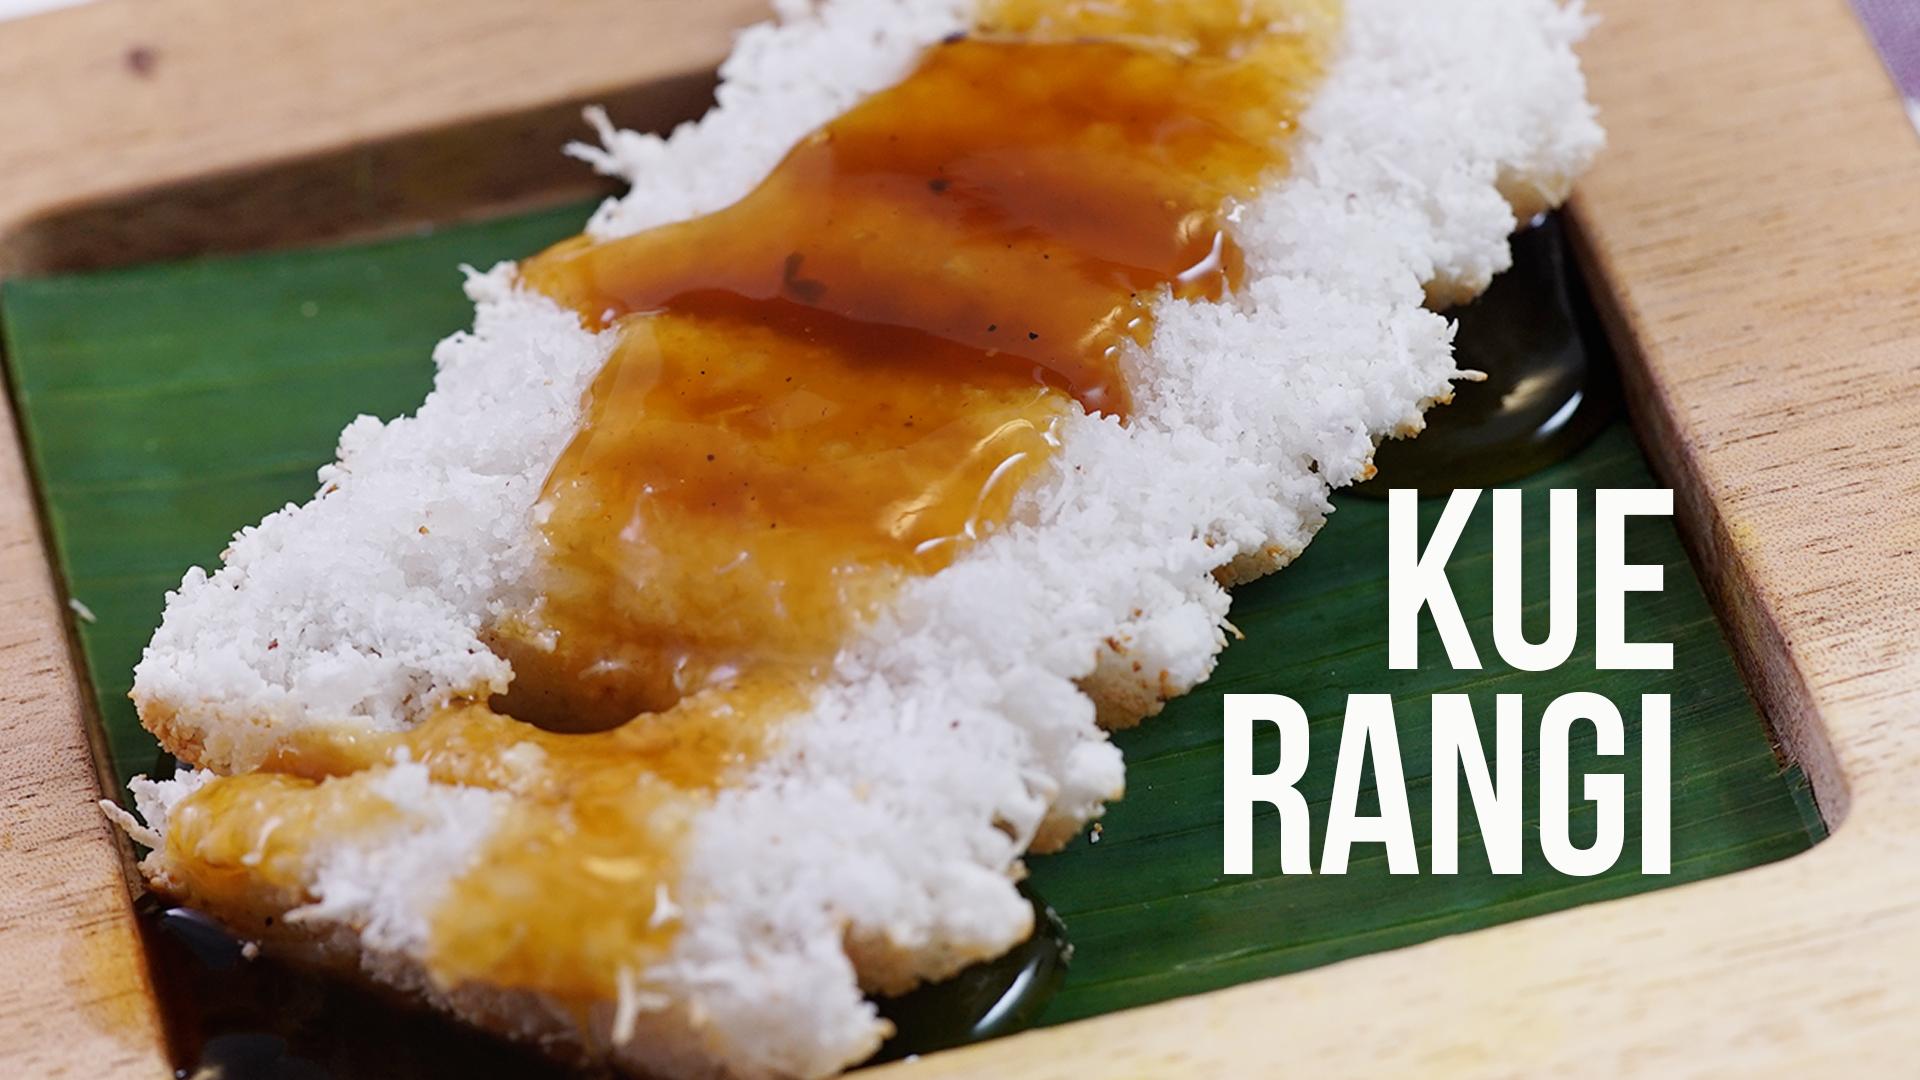 Jual Kue Basah Jajanan Pasar Snack Box Khas Betawi Di Tangerang